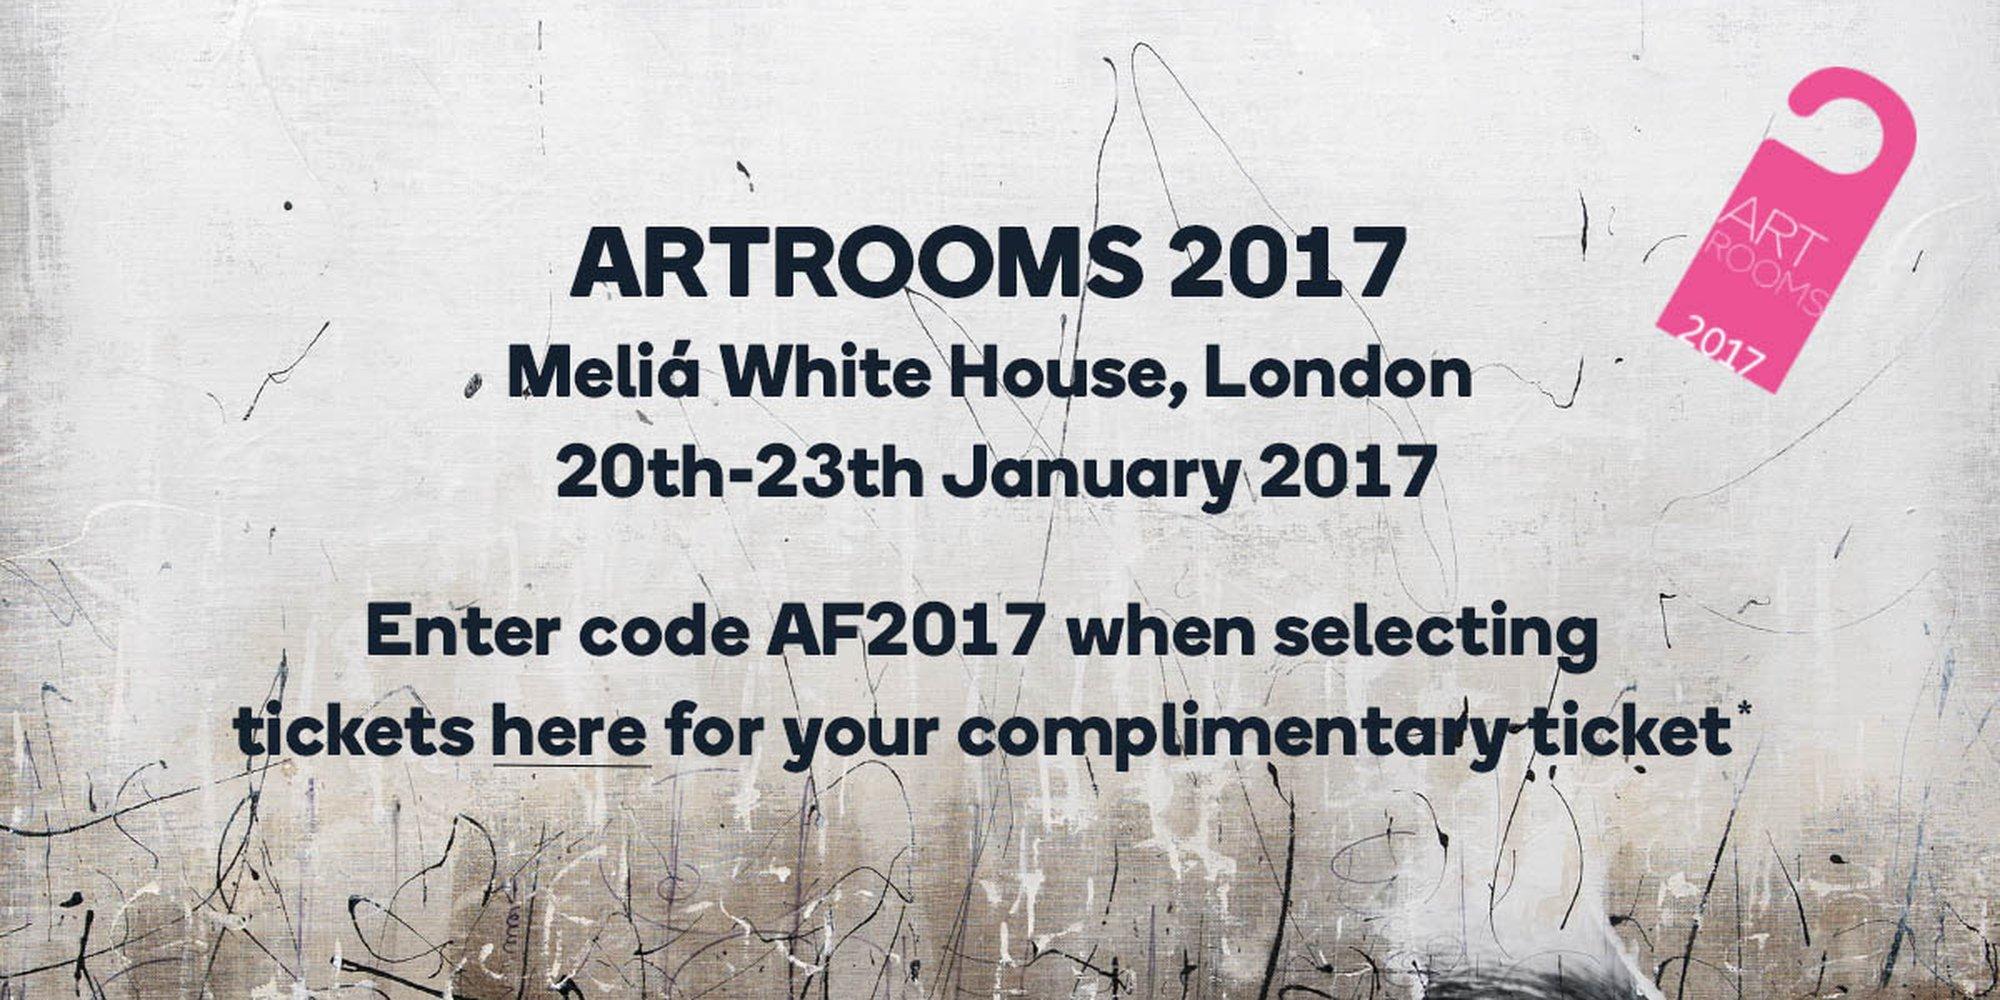 Artfinder is coming to ARTROOMS 2017